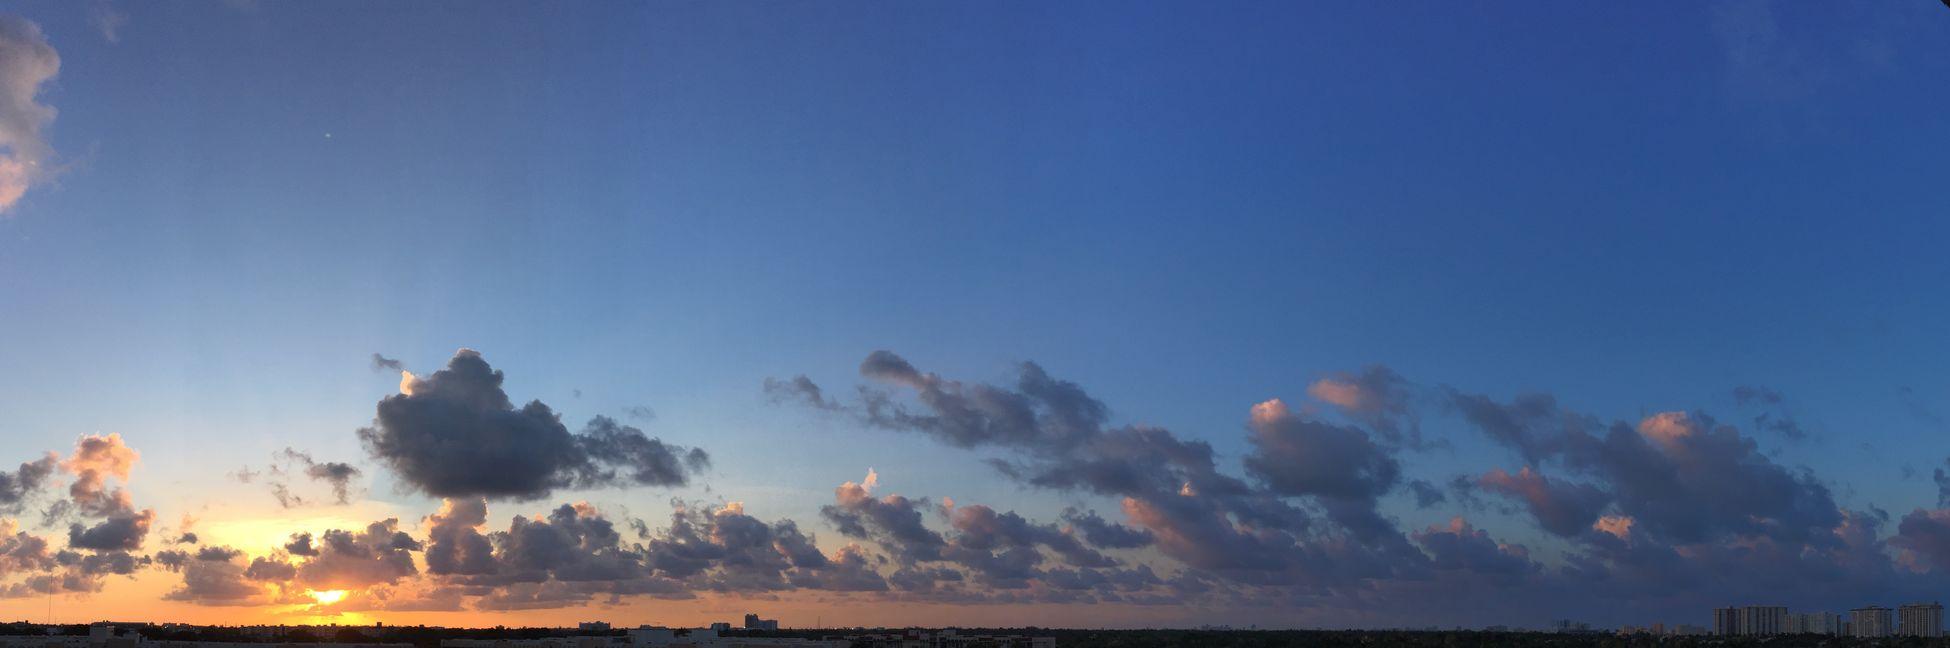 I just love Sunsets 🌅🌅🌅 ••• Sky Sunset Sun Miami Hallandale Beach Clouds Skyporn Thursday